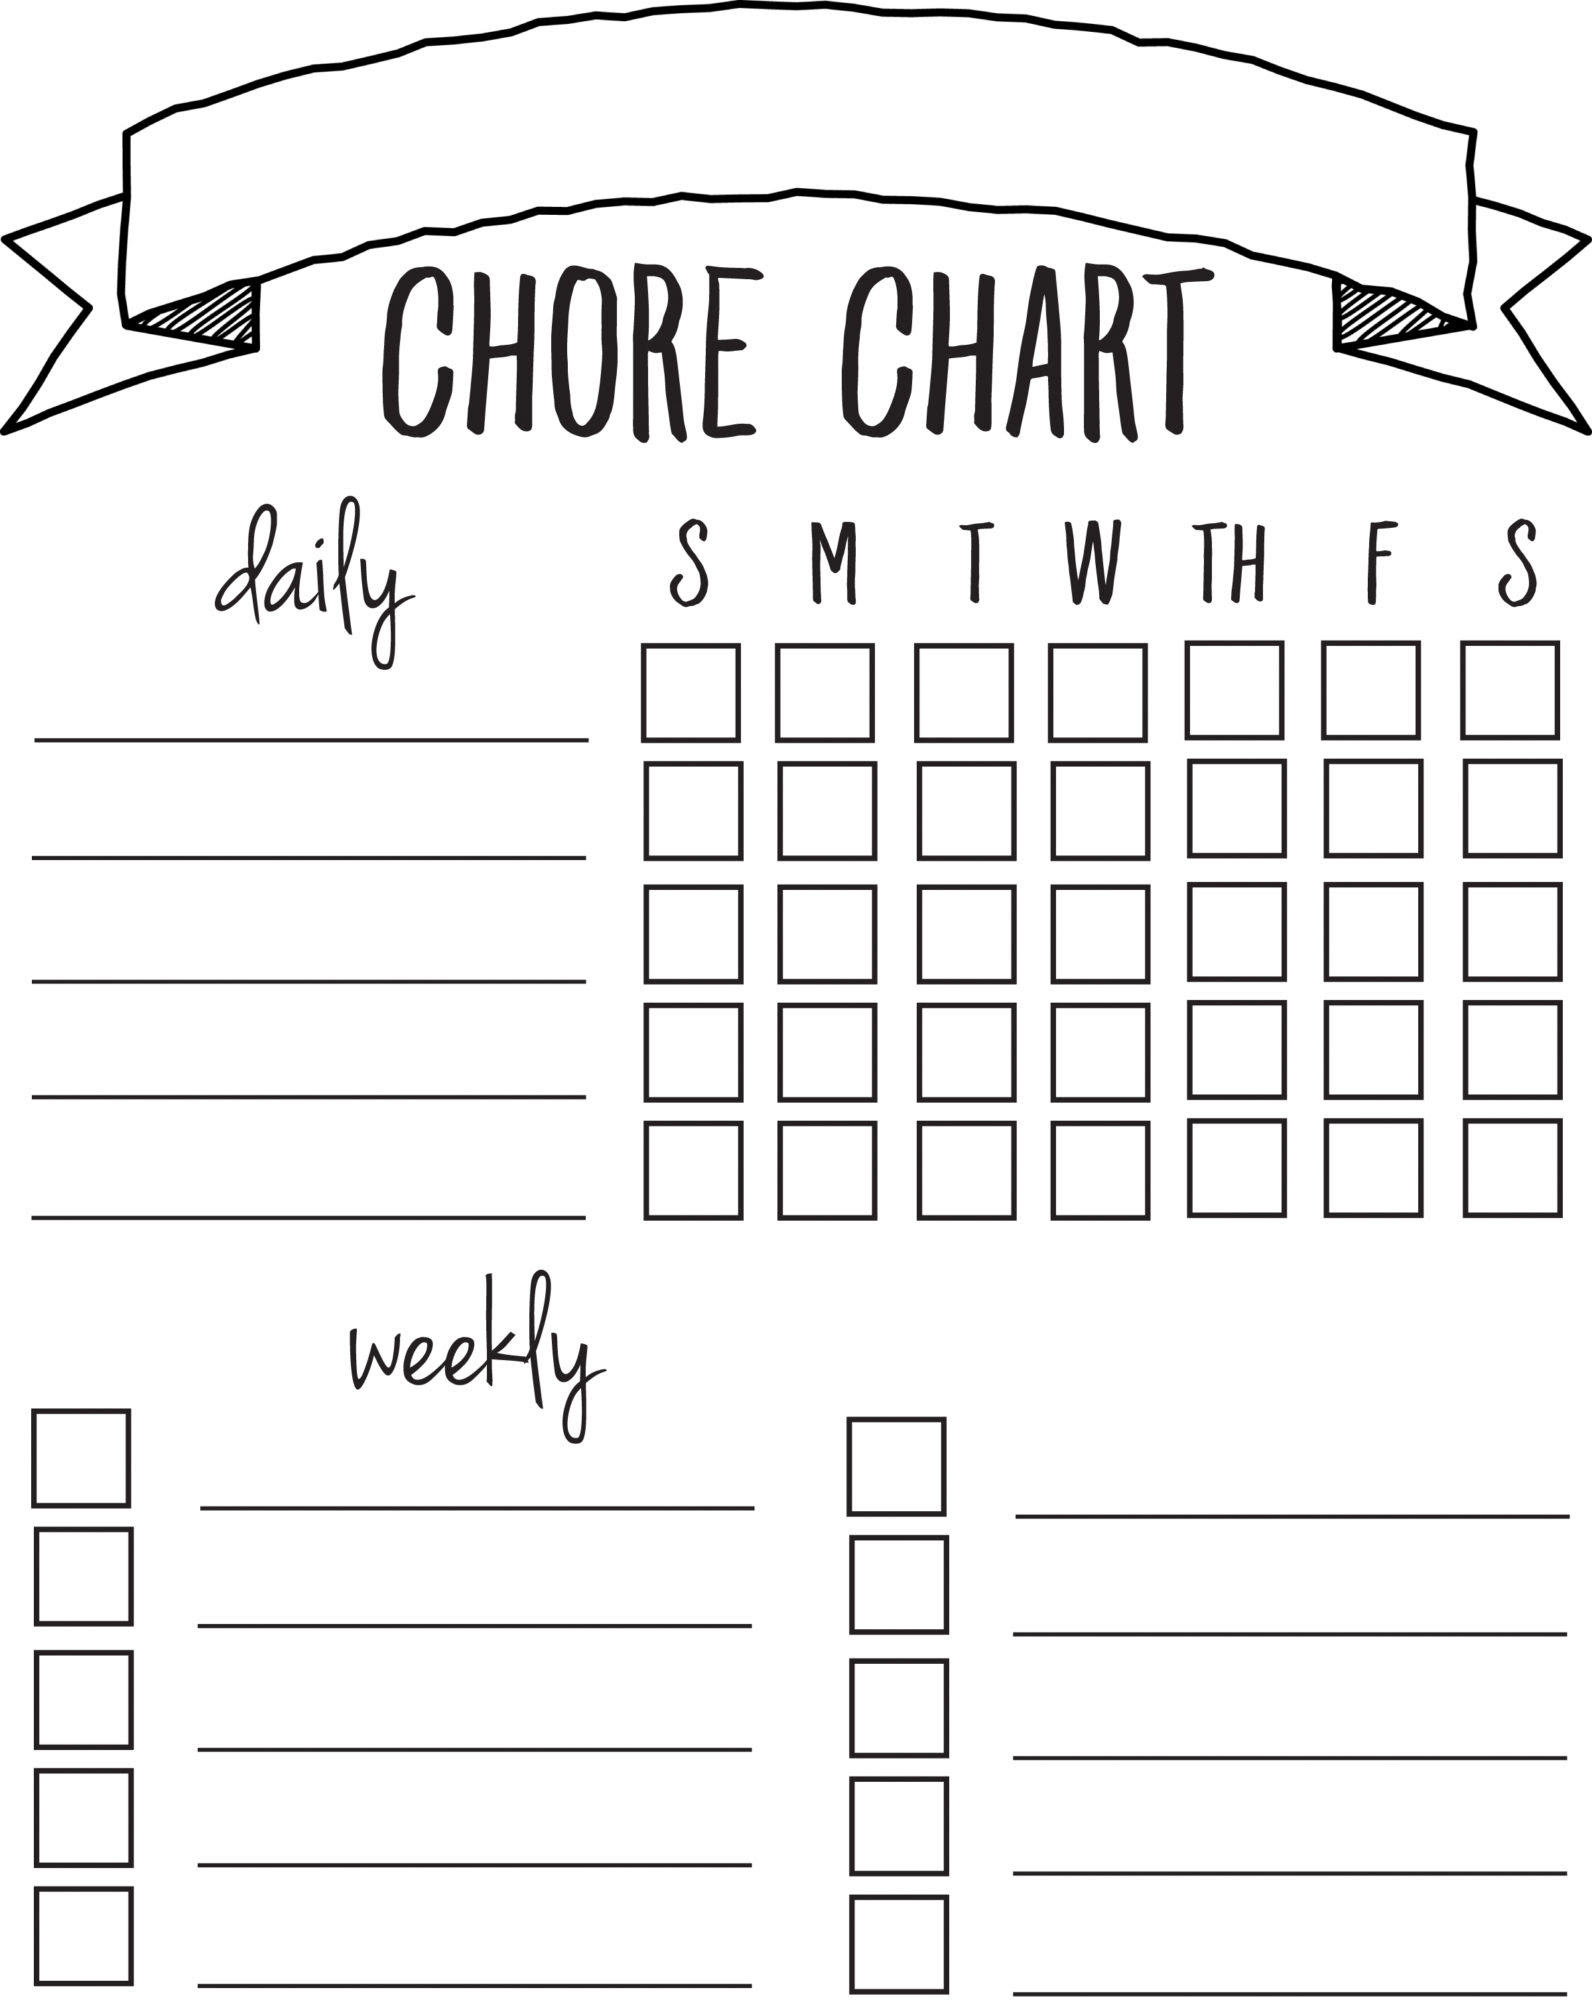 DIY Printable Chore Chart - Sincerely, Sara D.